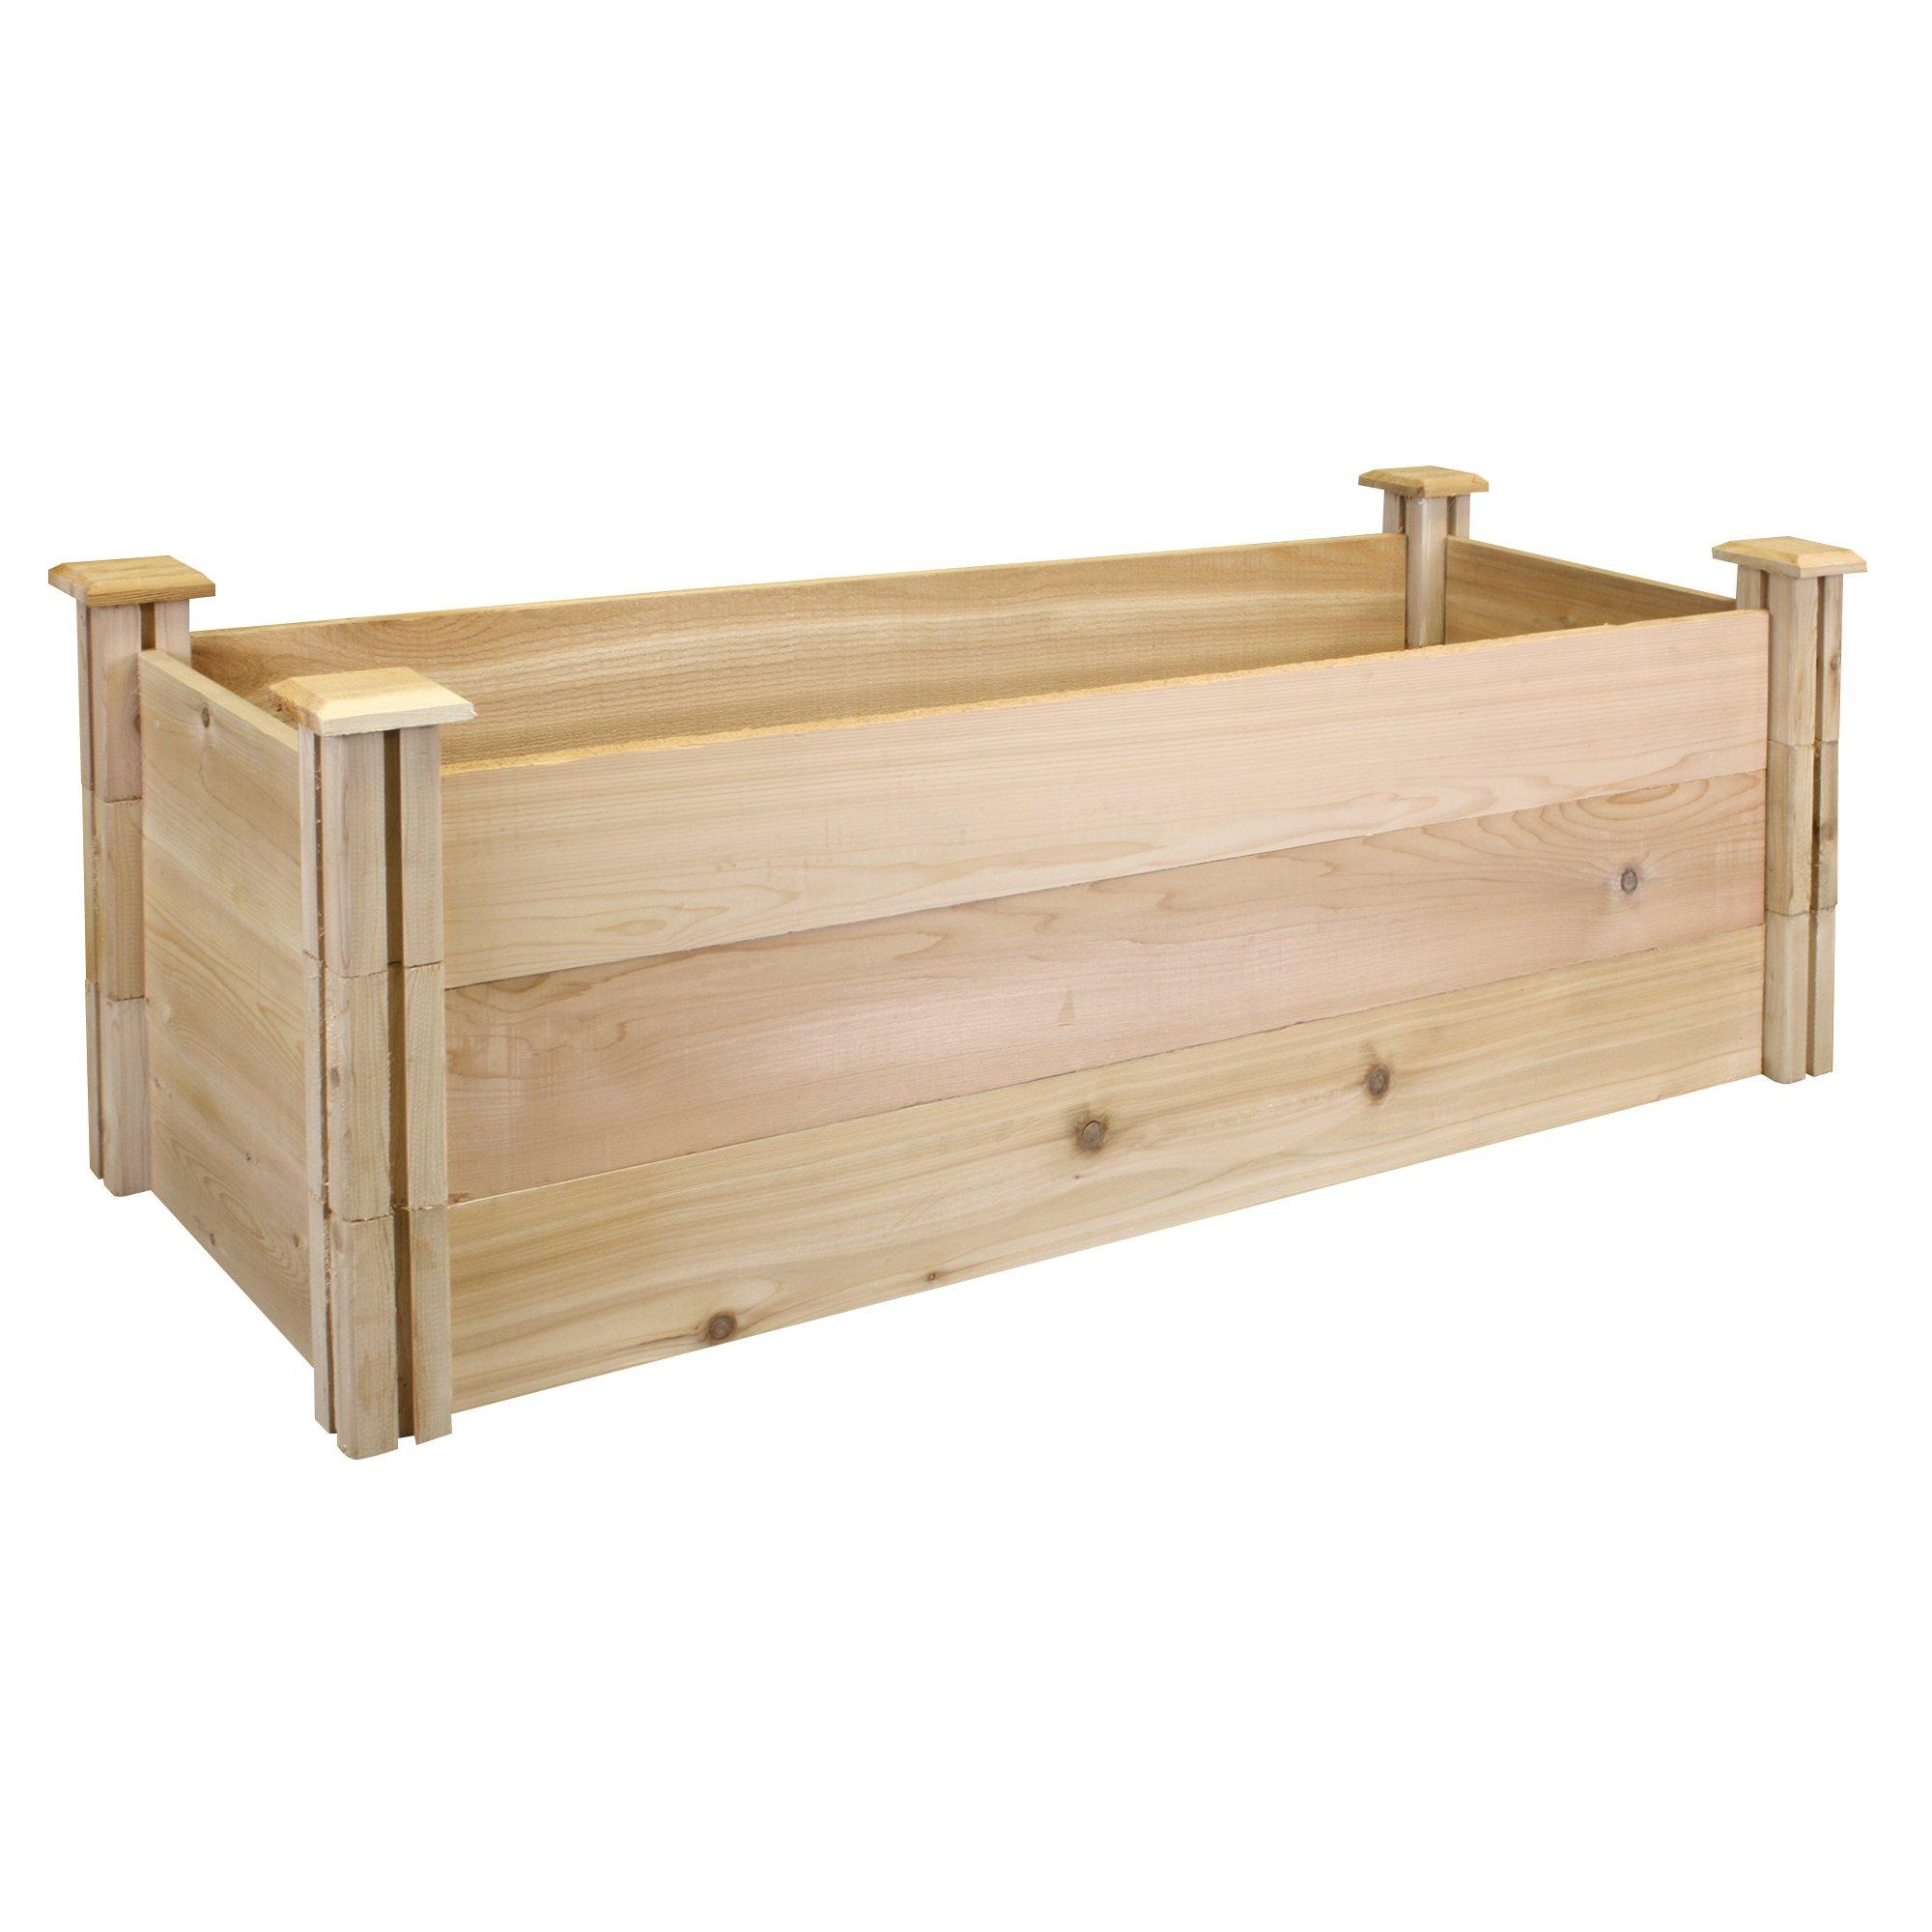 Greenes Fence Premium Cedar Raised Garden Bed, 16'' x 48'' x 16.5''